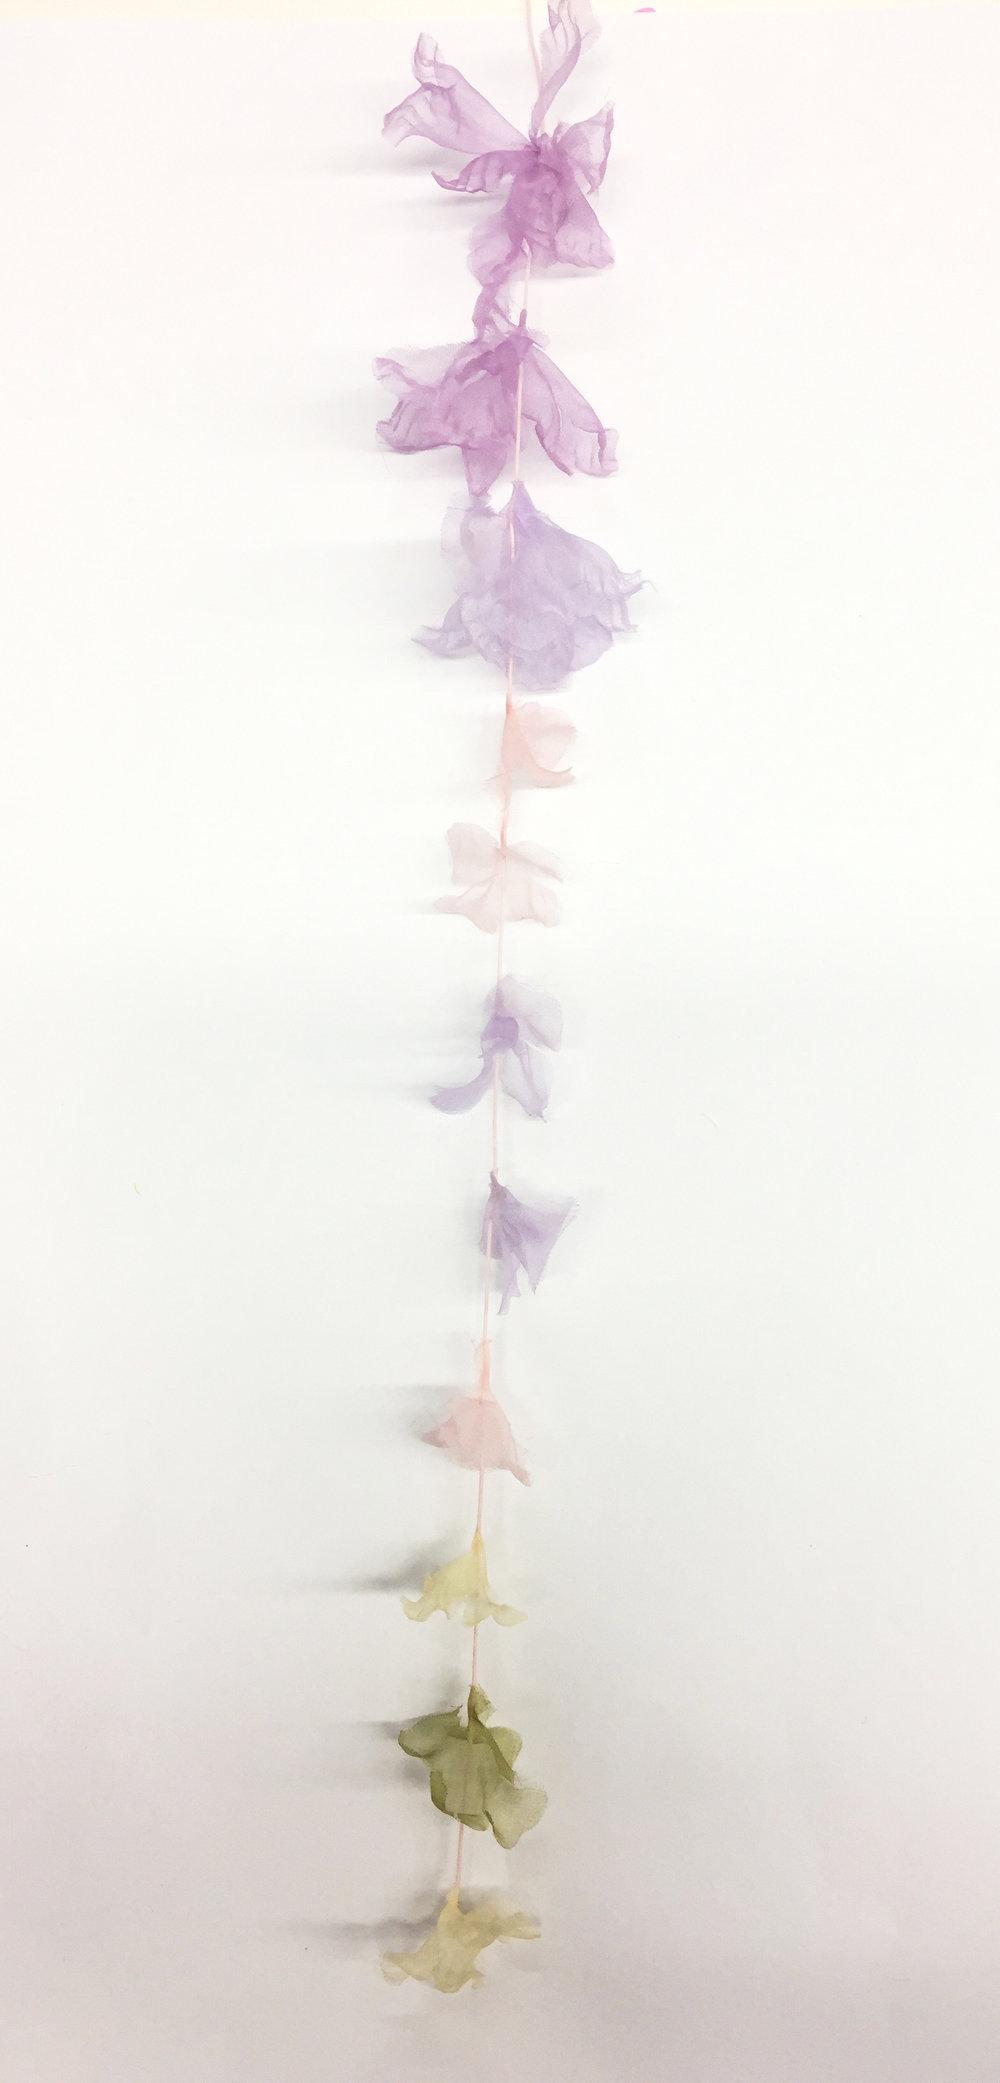 Design development for wisteria flower SS18